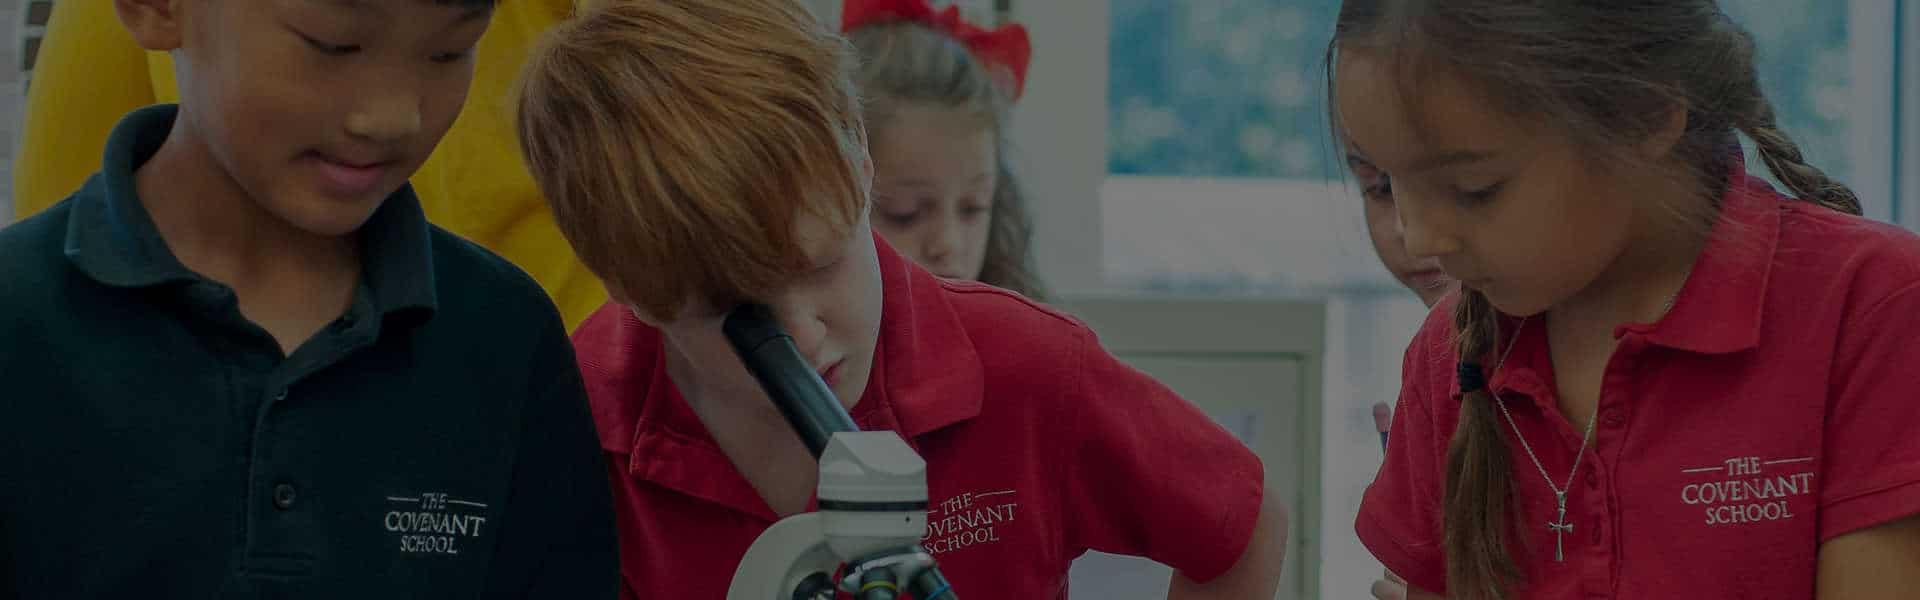 The Covenant School Website | Nashville Web Design | Darkstar Digital